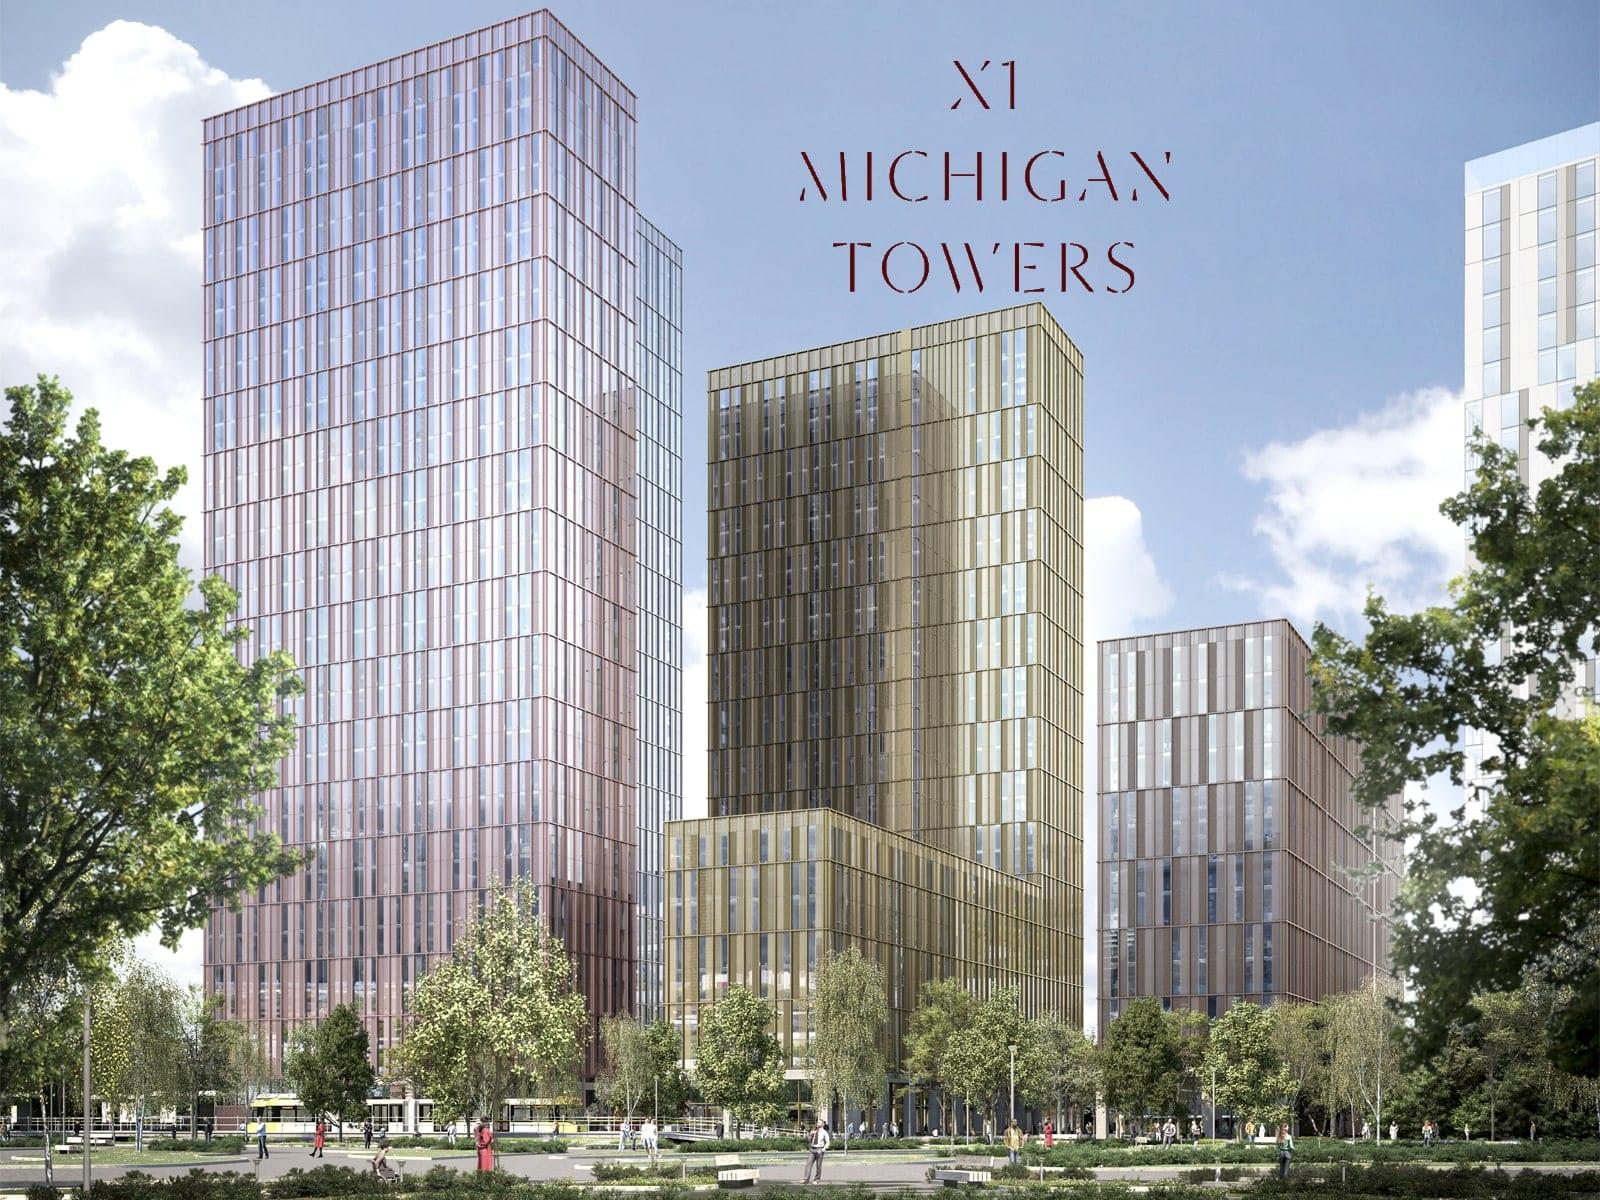 X1 Michigan Towers